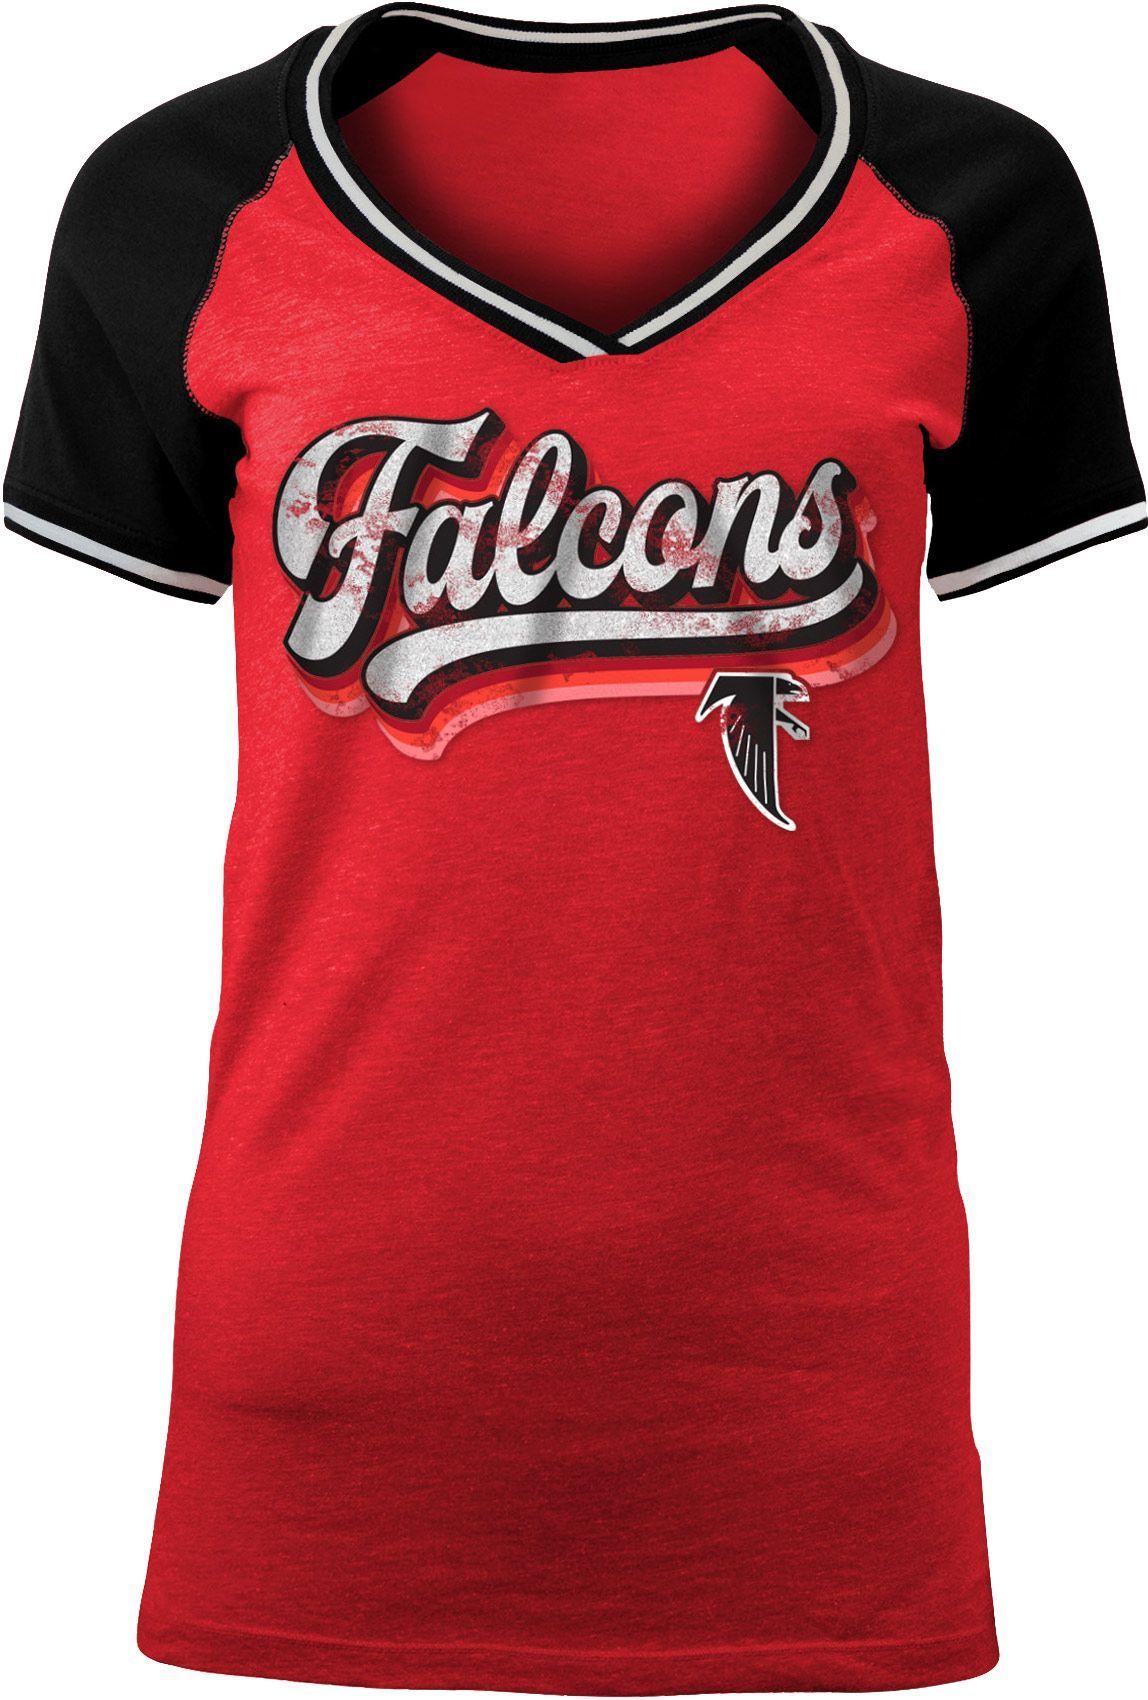 best service 8c611 89622 NFL Team Apparel Women's Atlanta Falcons Retro Glitter T ...